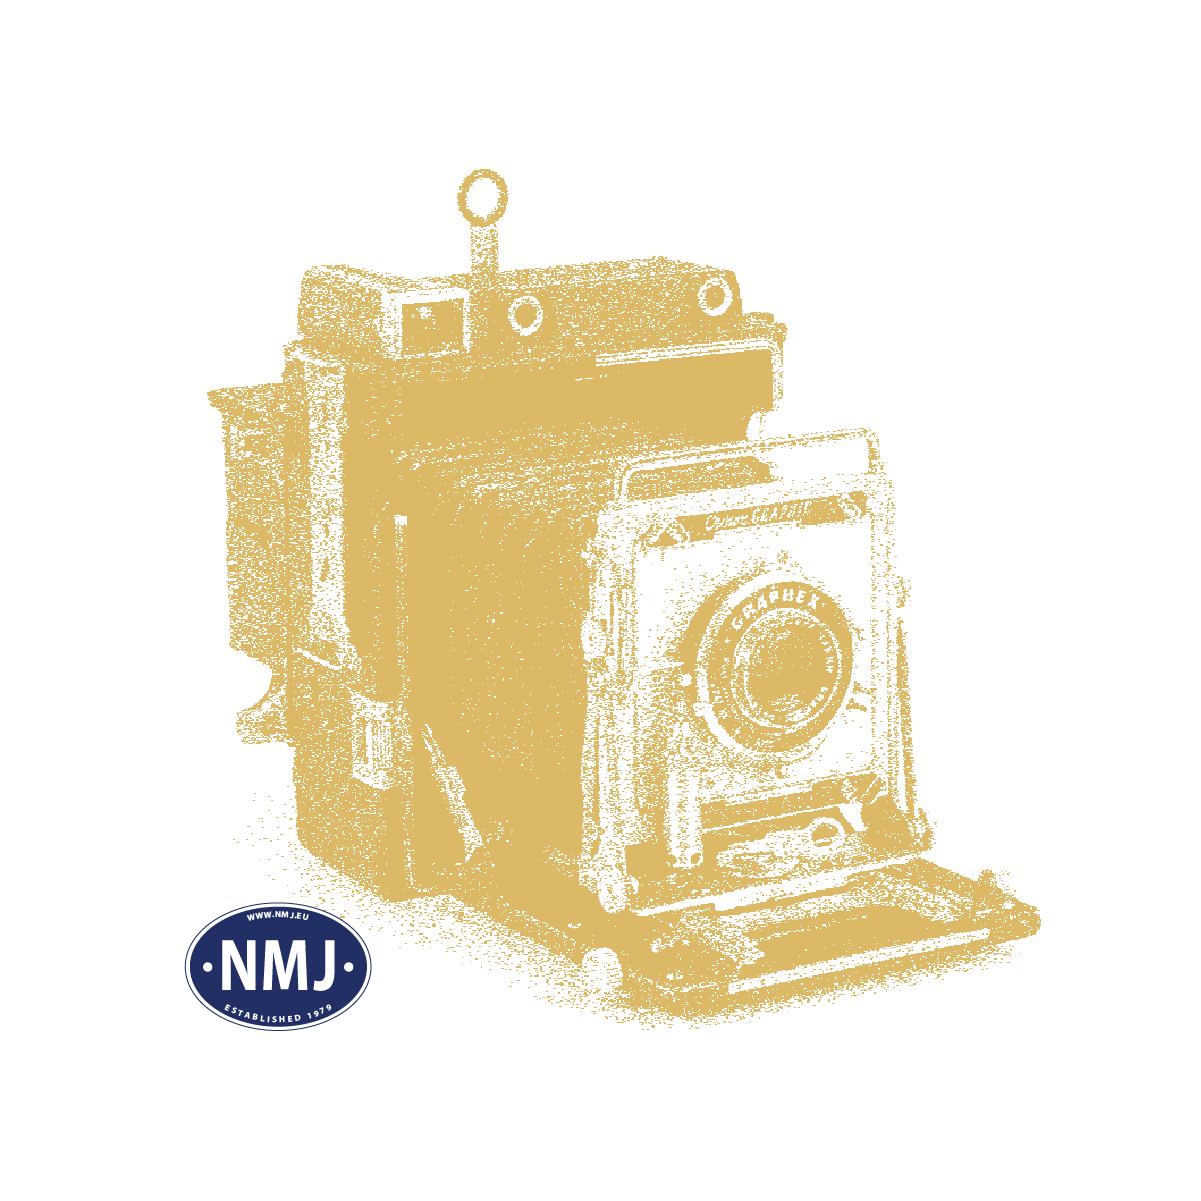 "NMJT90212 - NMJ Topline MAV M61 019 ""Classic"", DC"